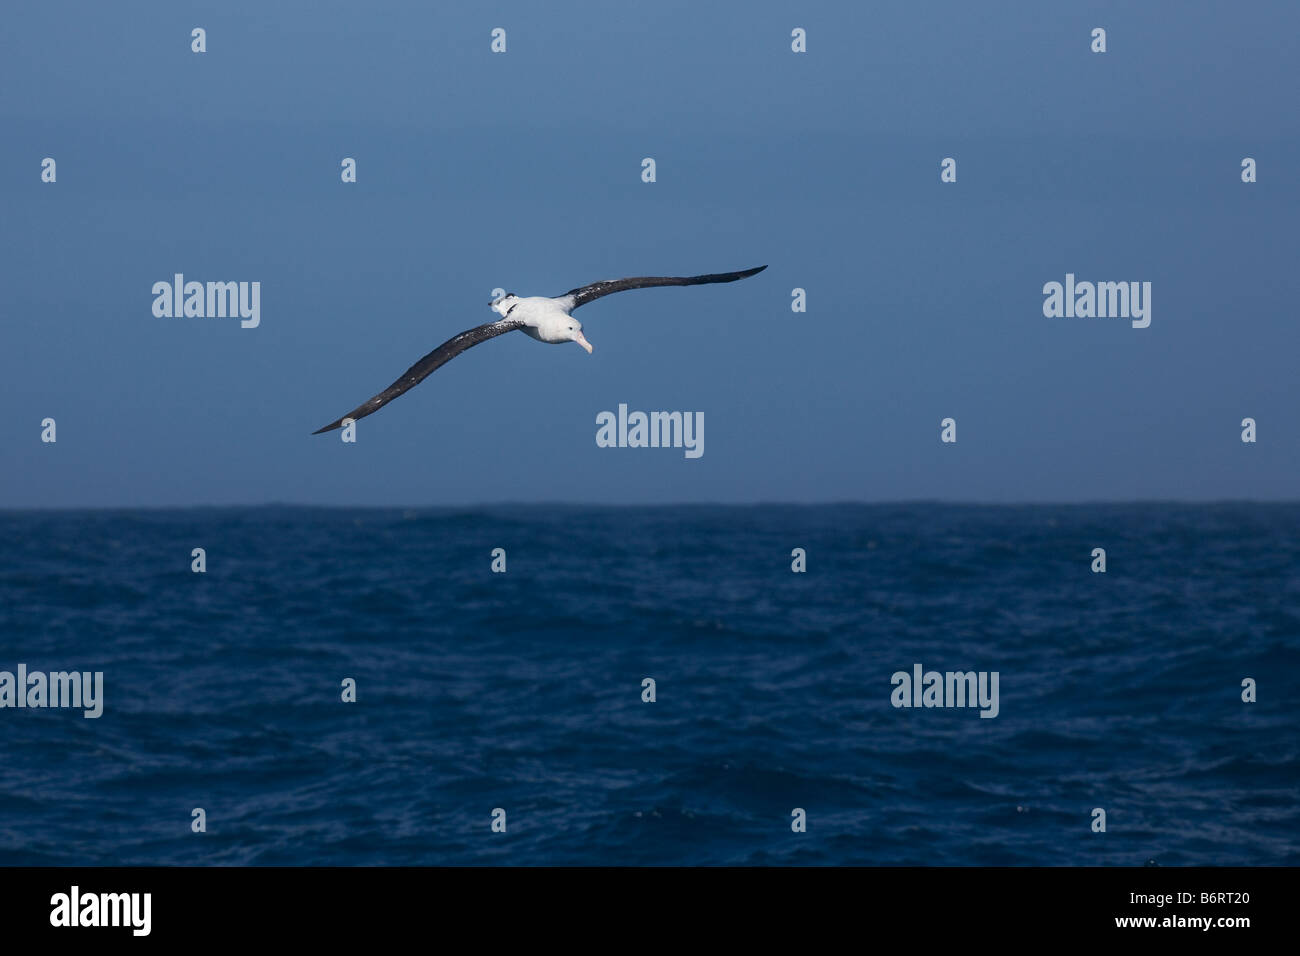 Wandering Albatross Diomedea exulans in flight Drake Passage Southern Ocean Antarctica - Stock Image